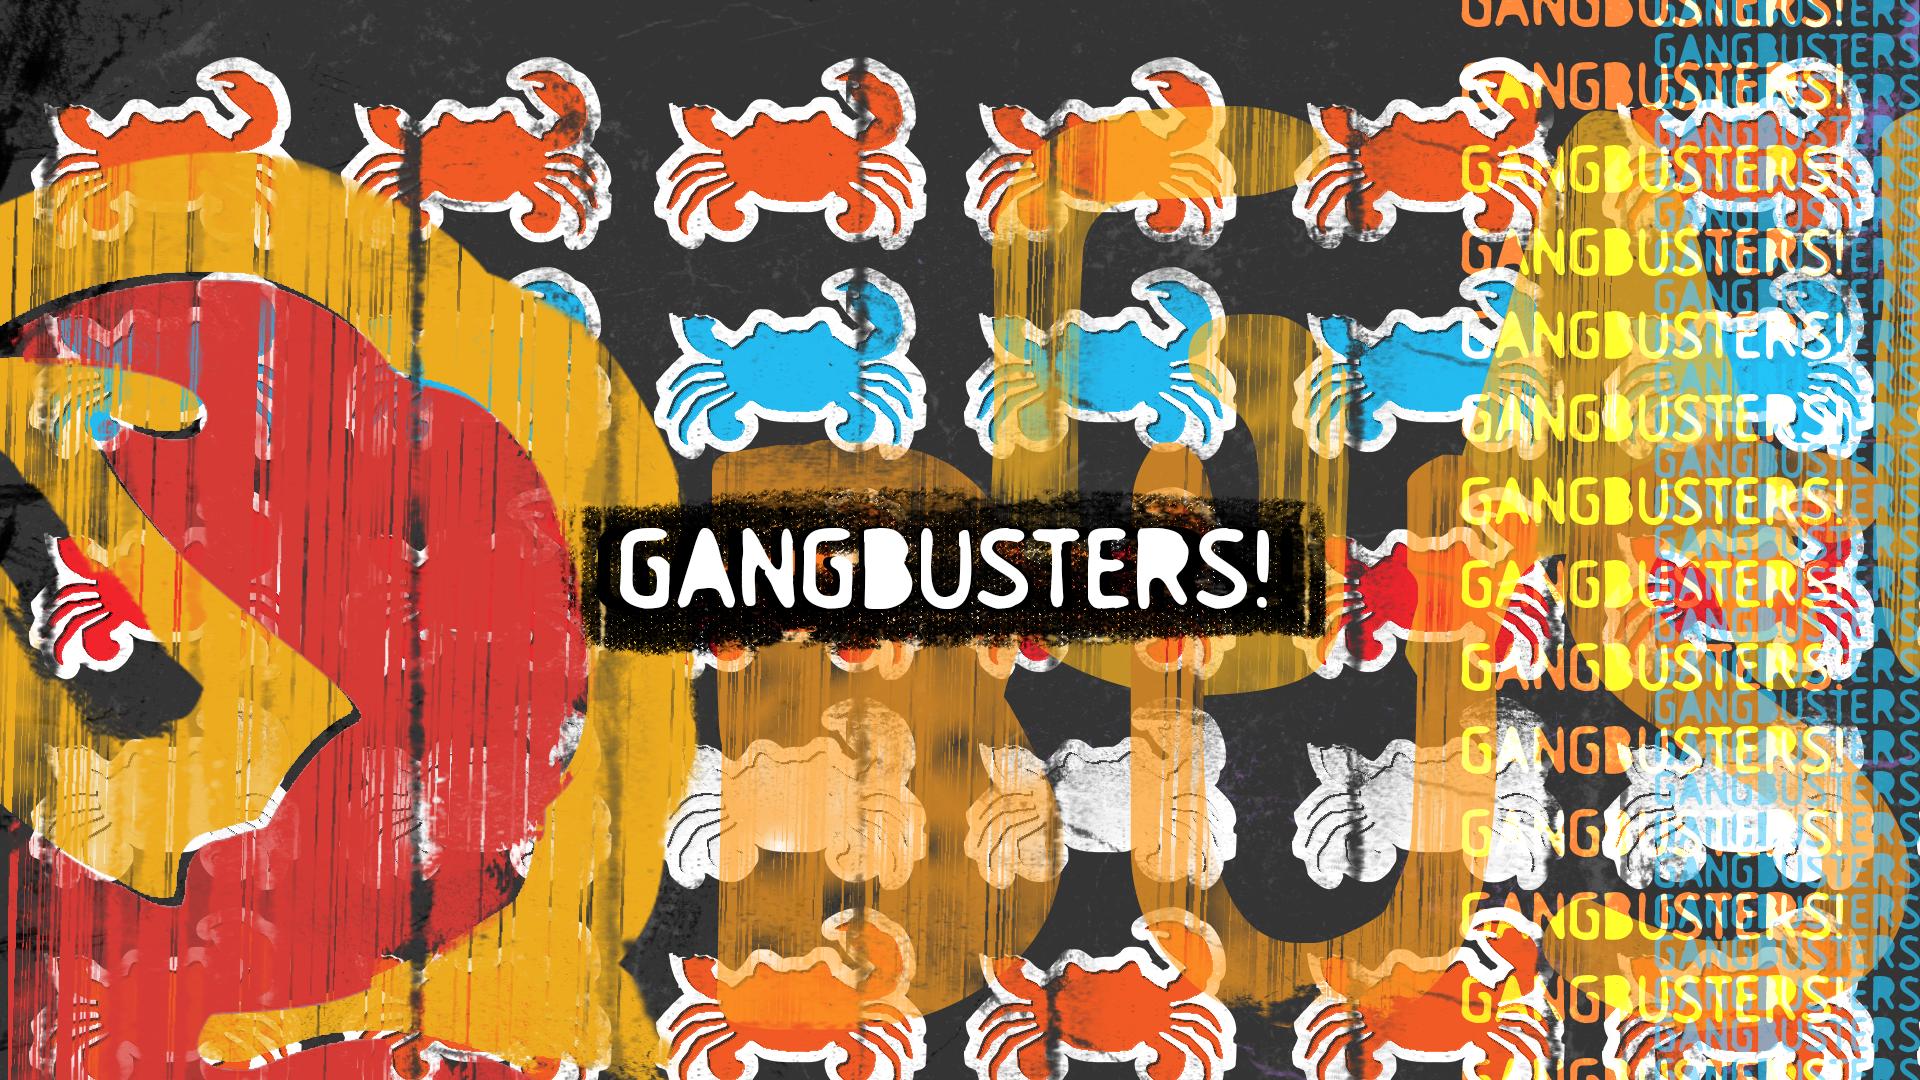 gangbusters-test-prints.jpg